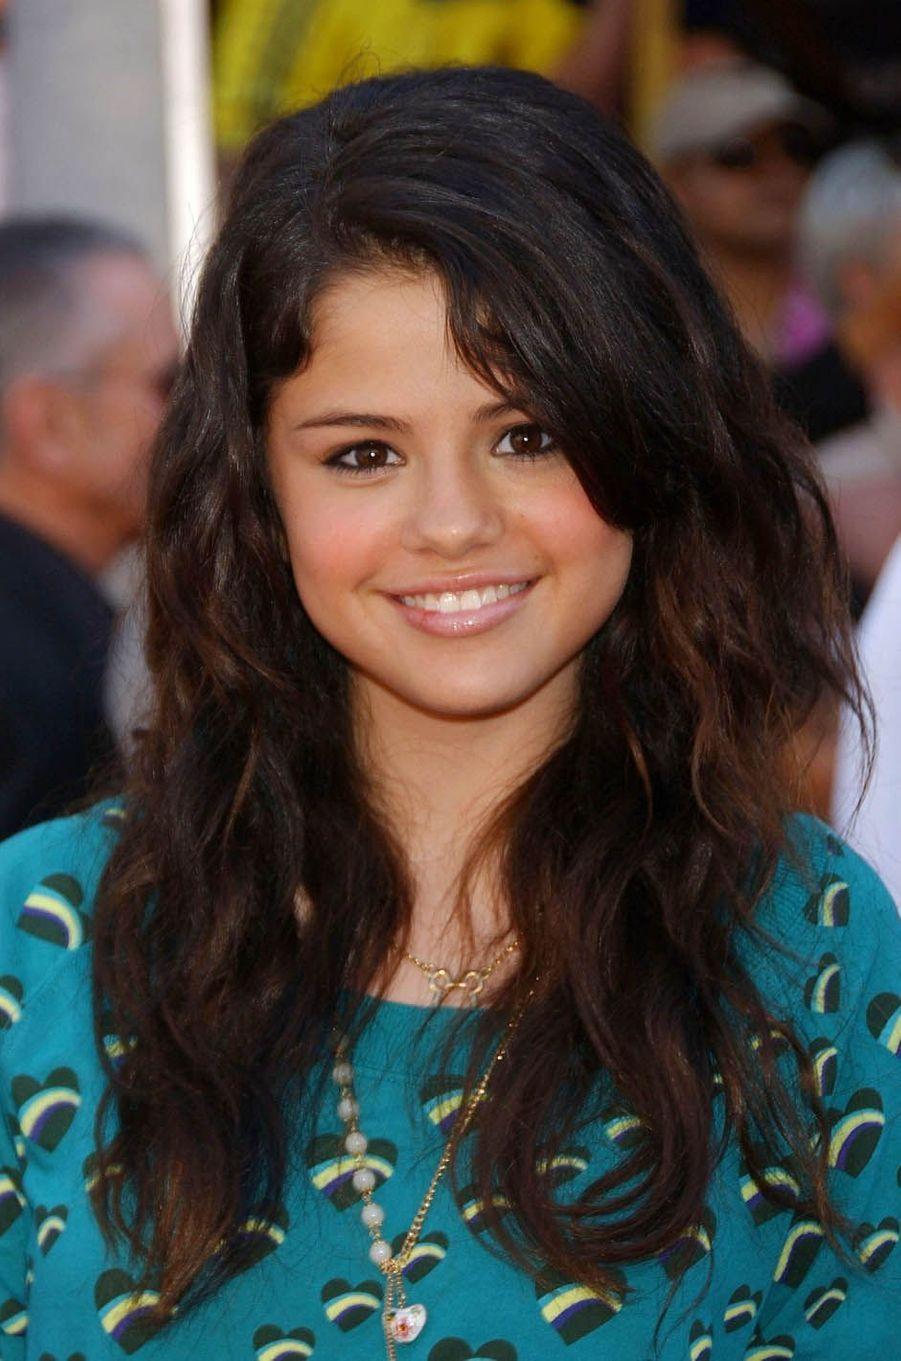 Selena Gomez en 2007.